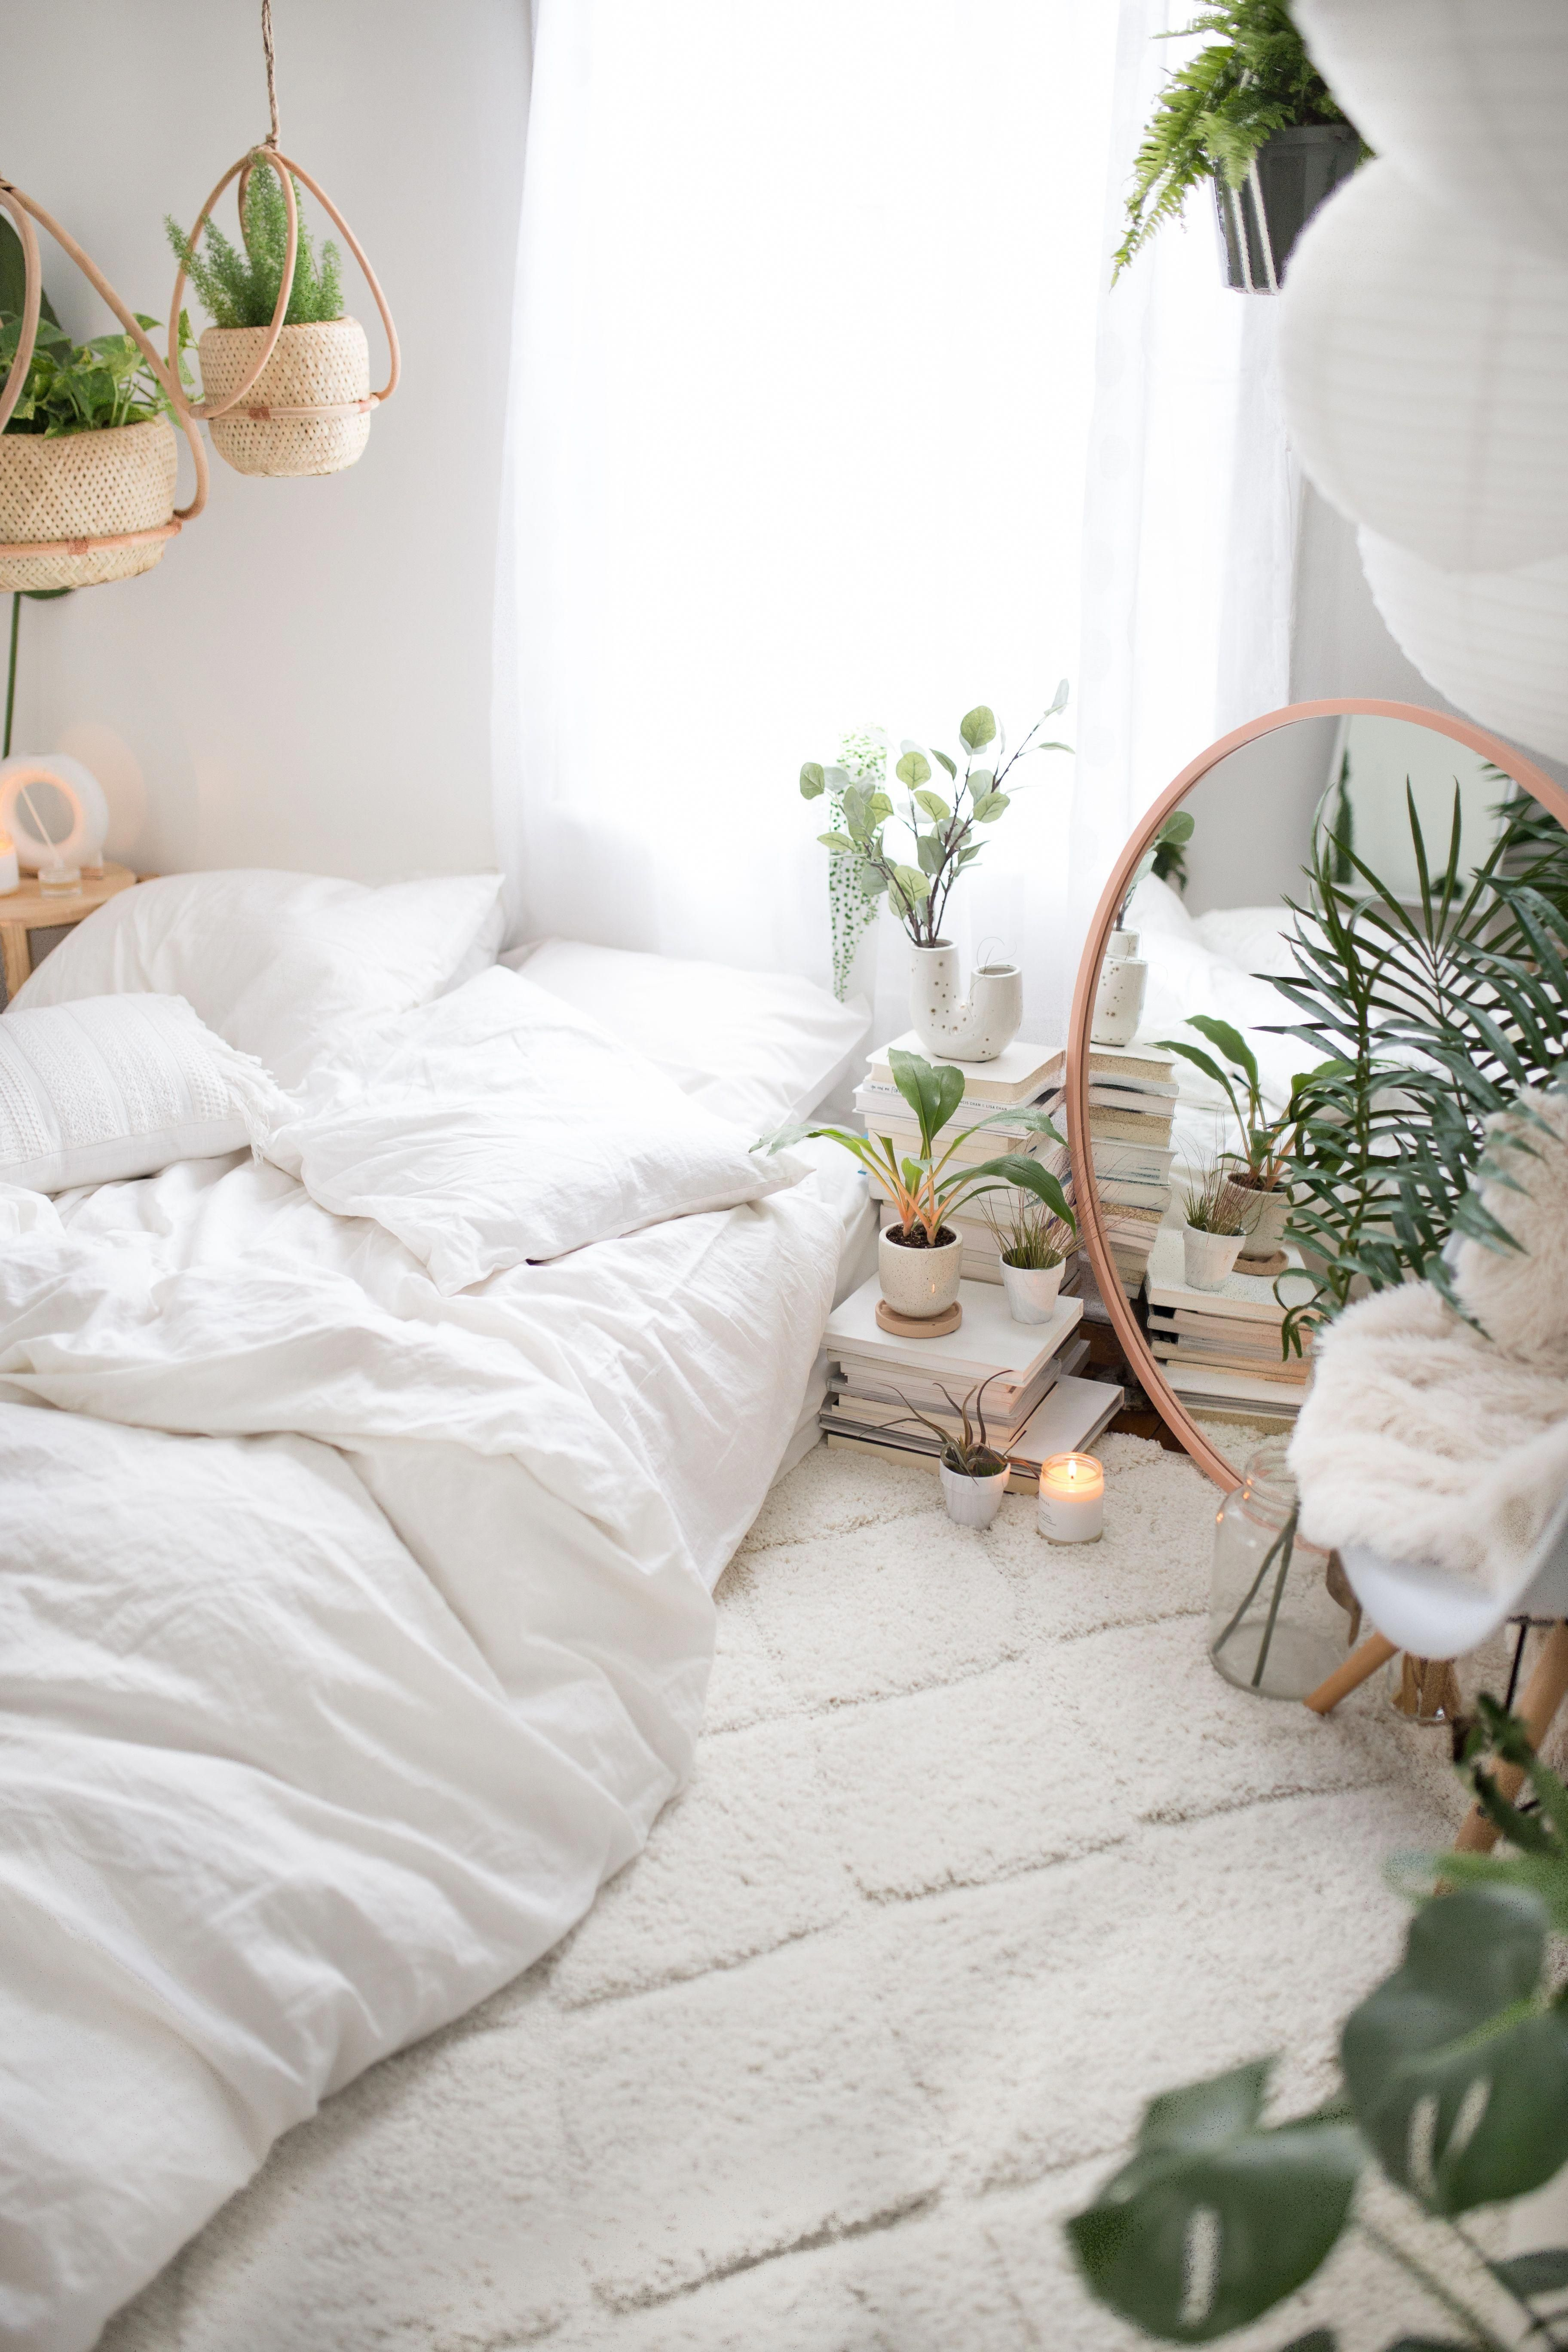 Minimalist Jungle White Bohemian Bedroom Decor With Mattress On